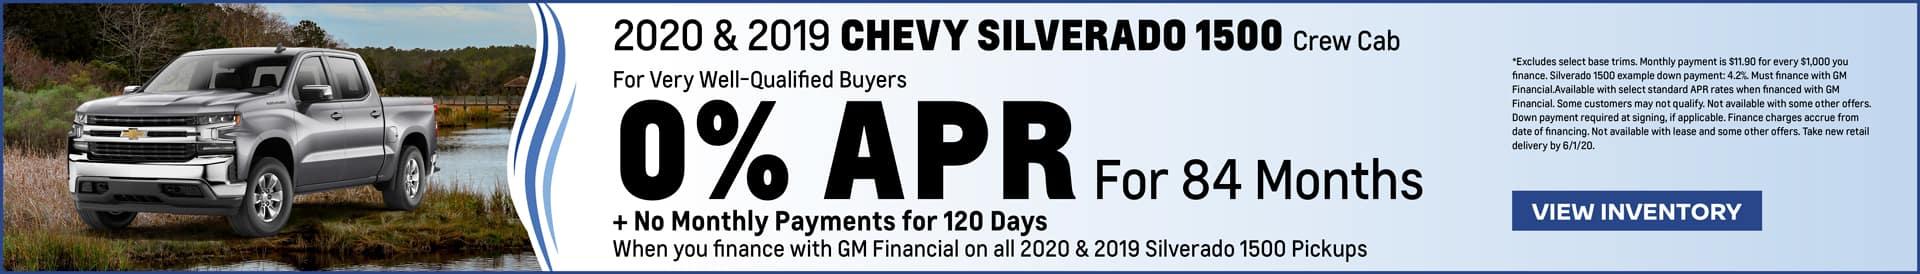 Coastal Saves Chevy 0% APR for 84 months on a Silverado 1500